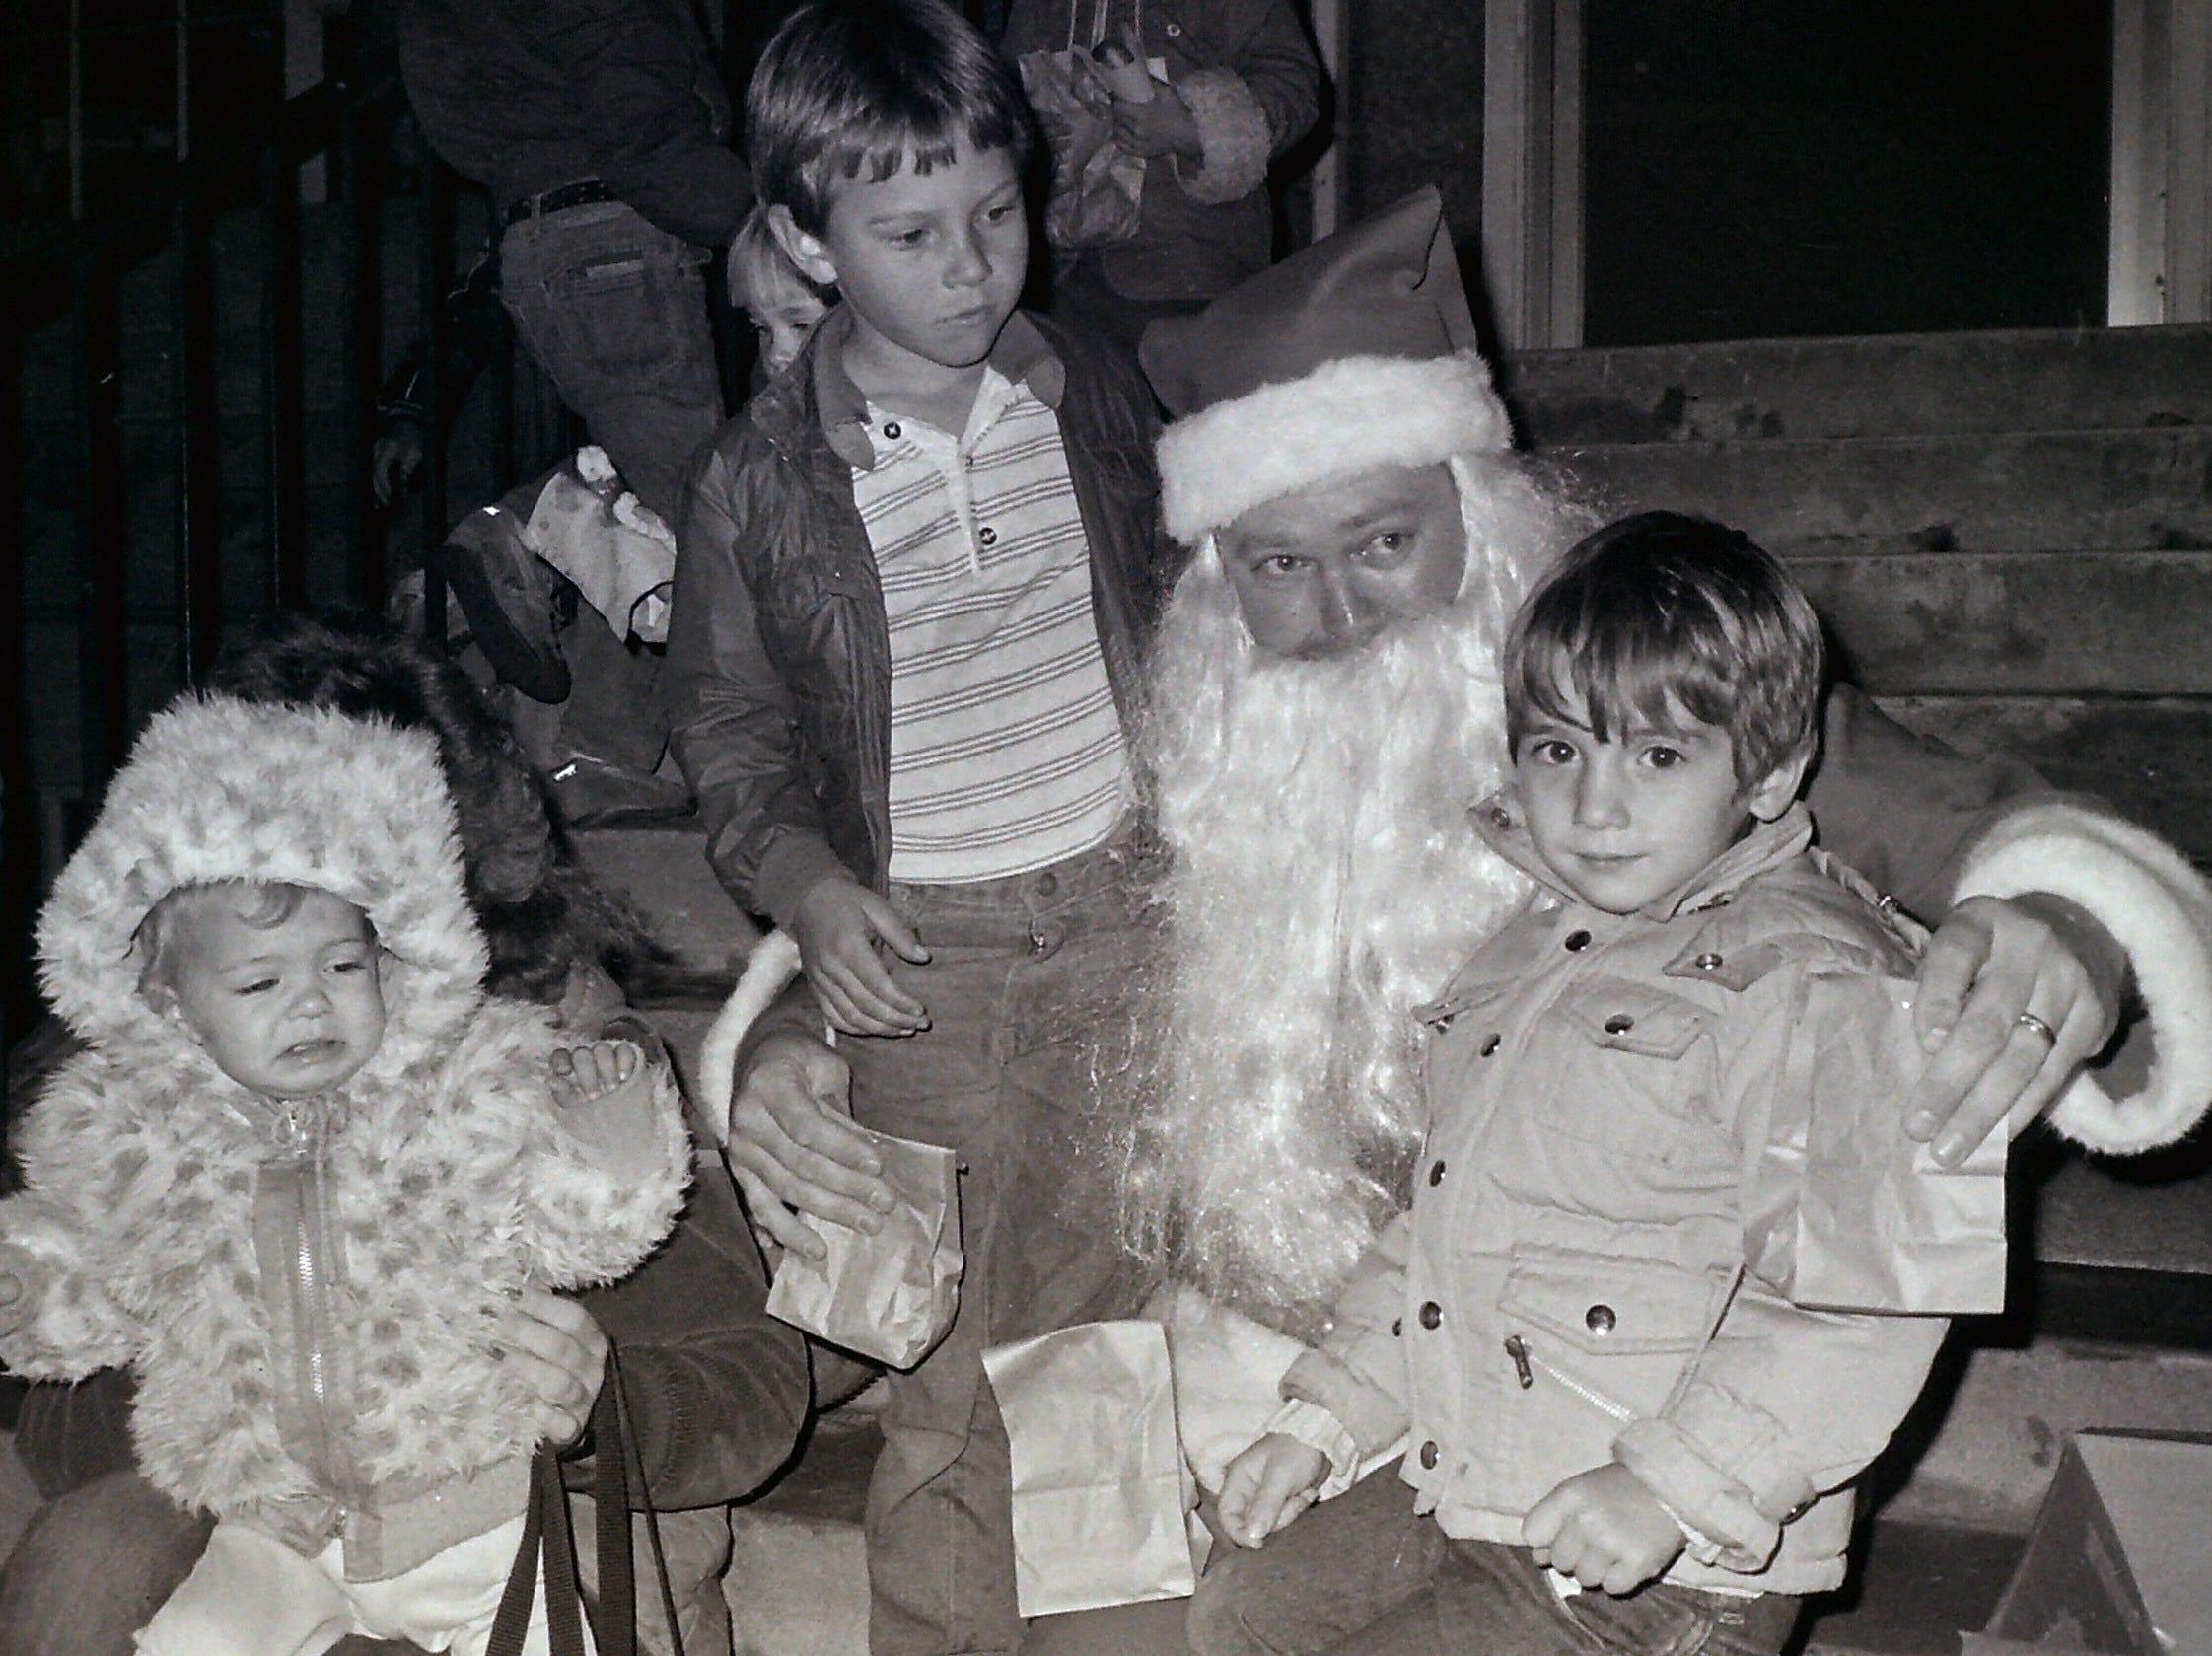 Holiday street lighting circa 1985.